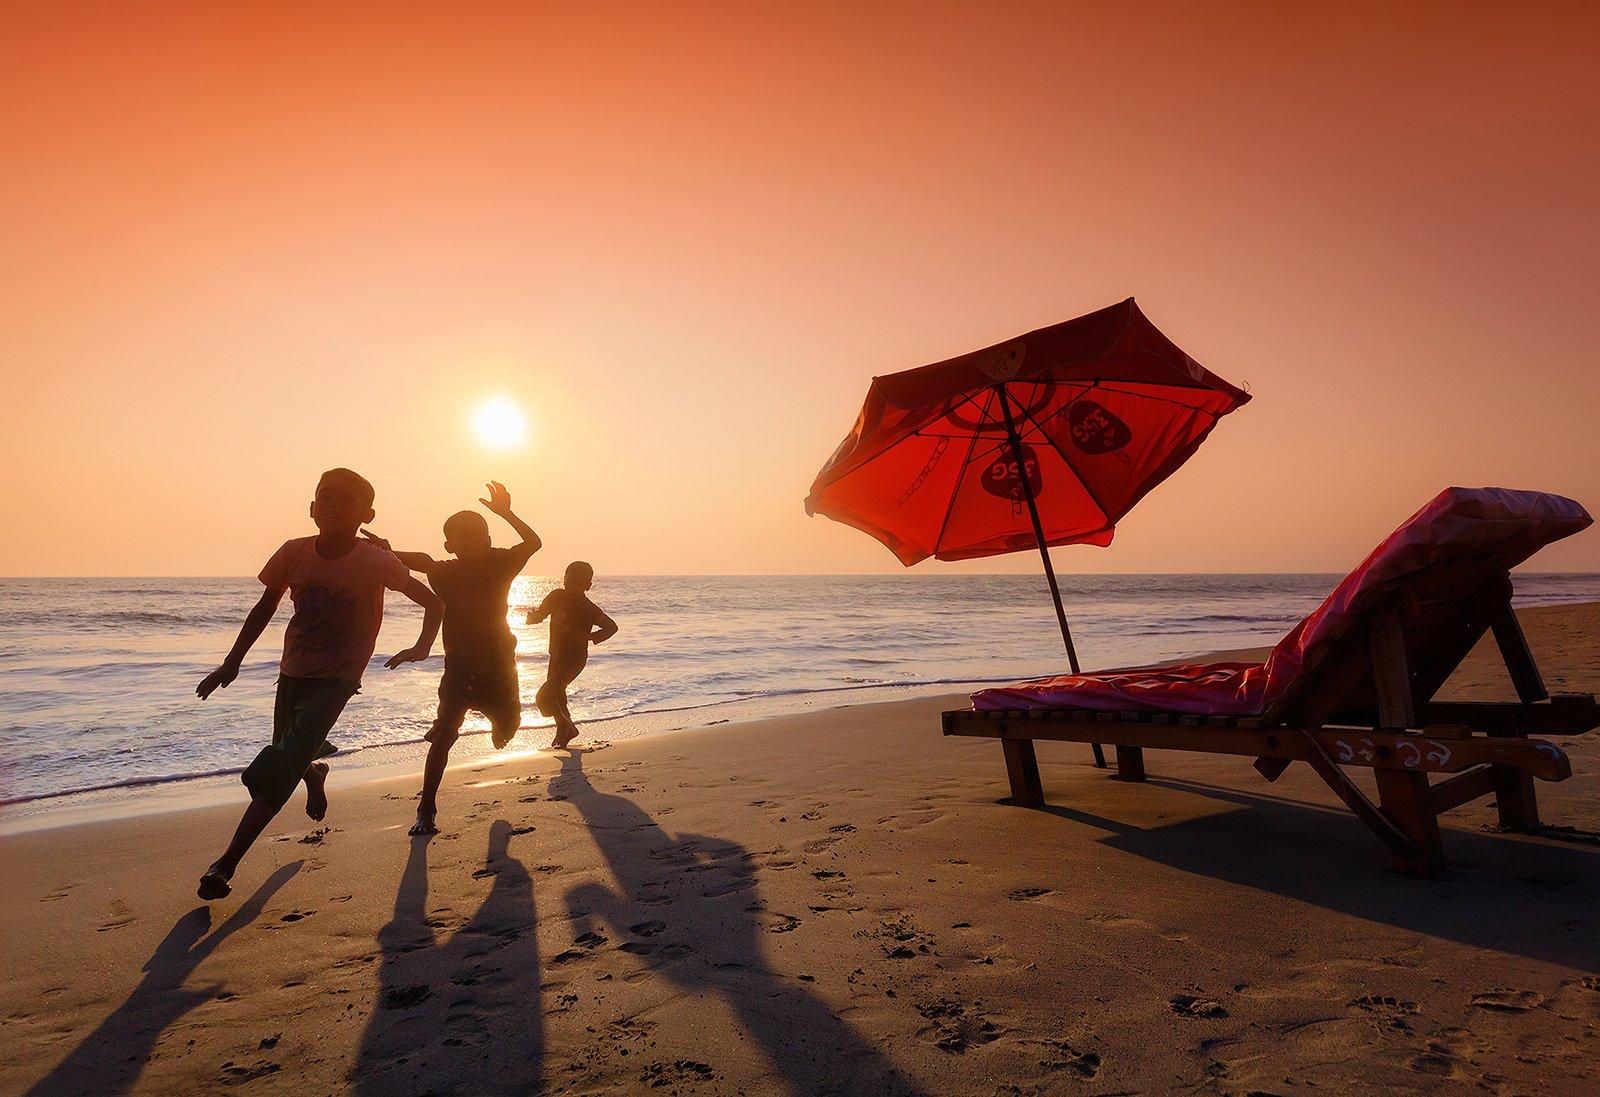 бангладеш, кокс базар, закат, дети, пляж, оранжевый, Бирюков Юрий